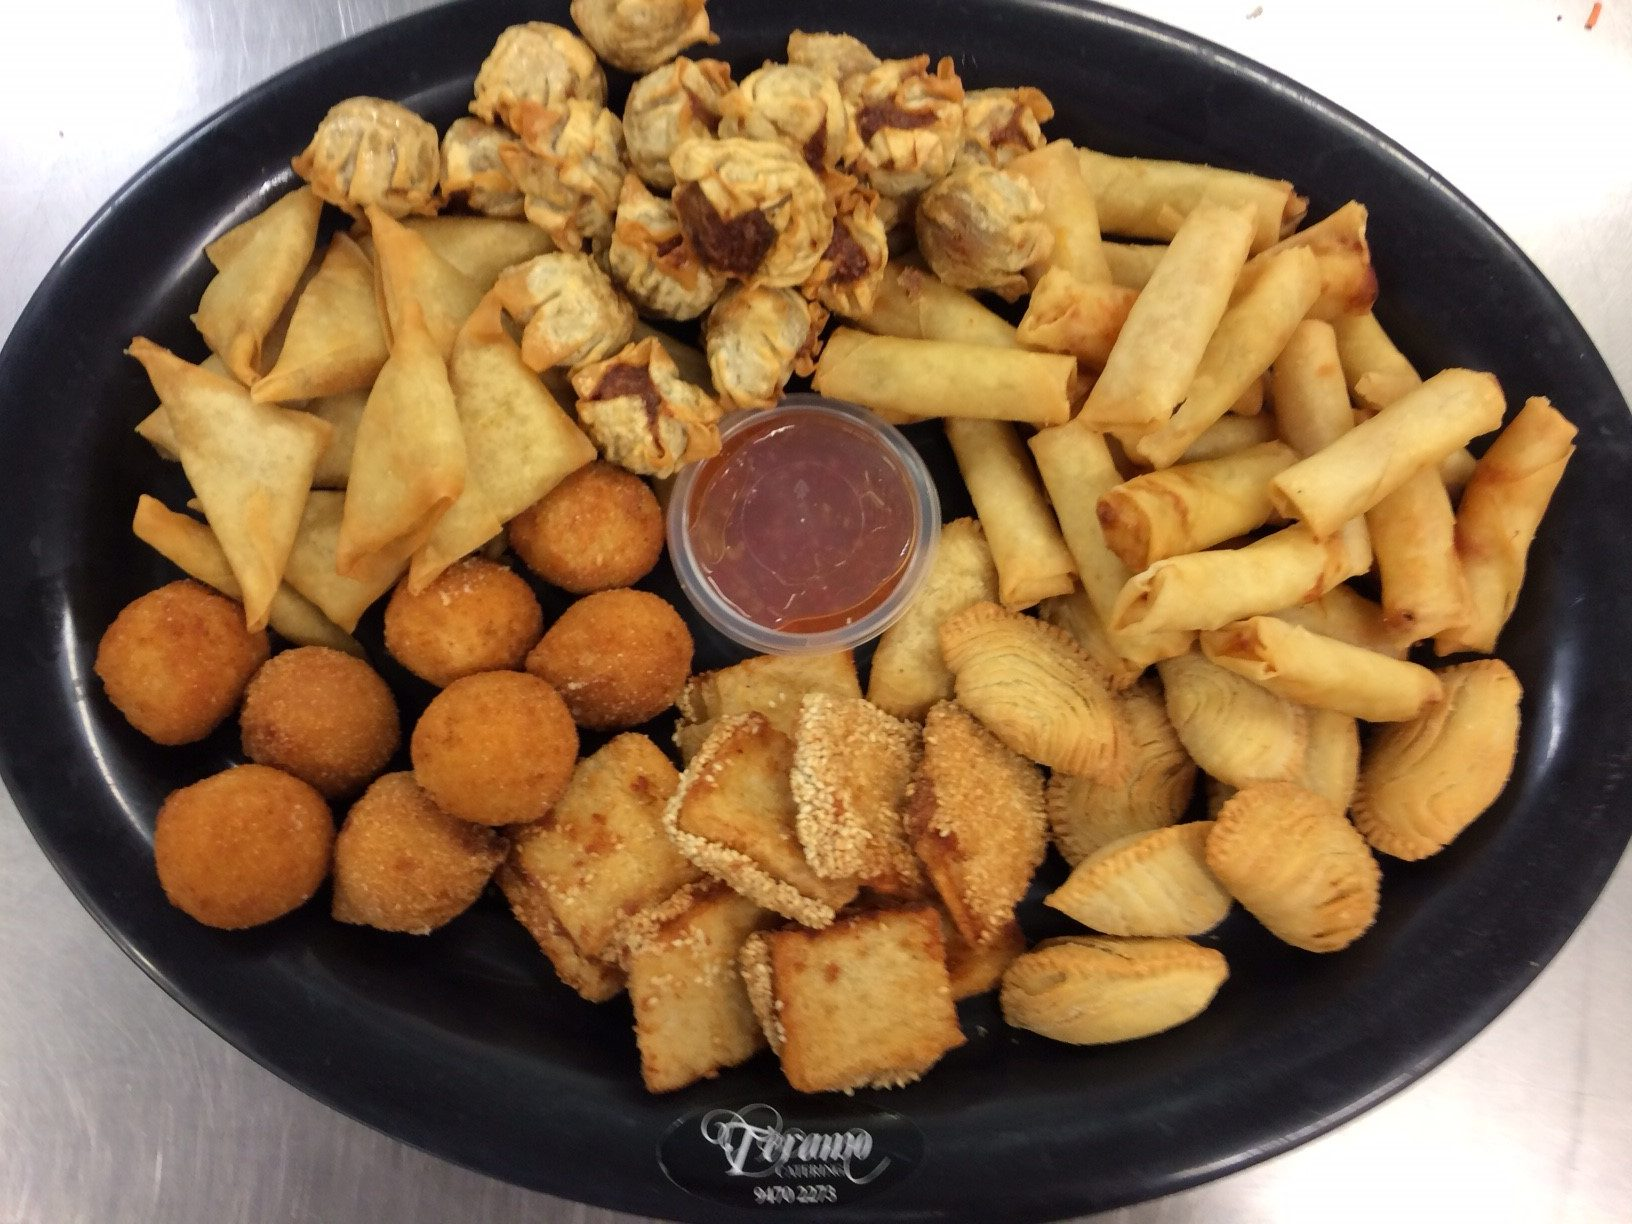 Asian Hot Food Platter